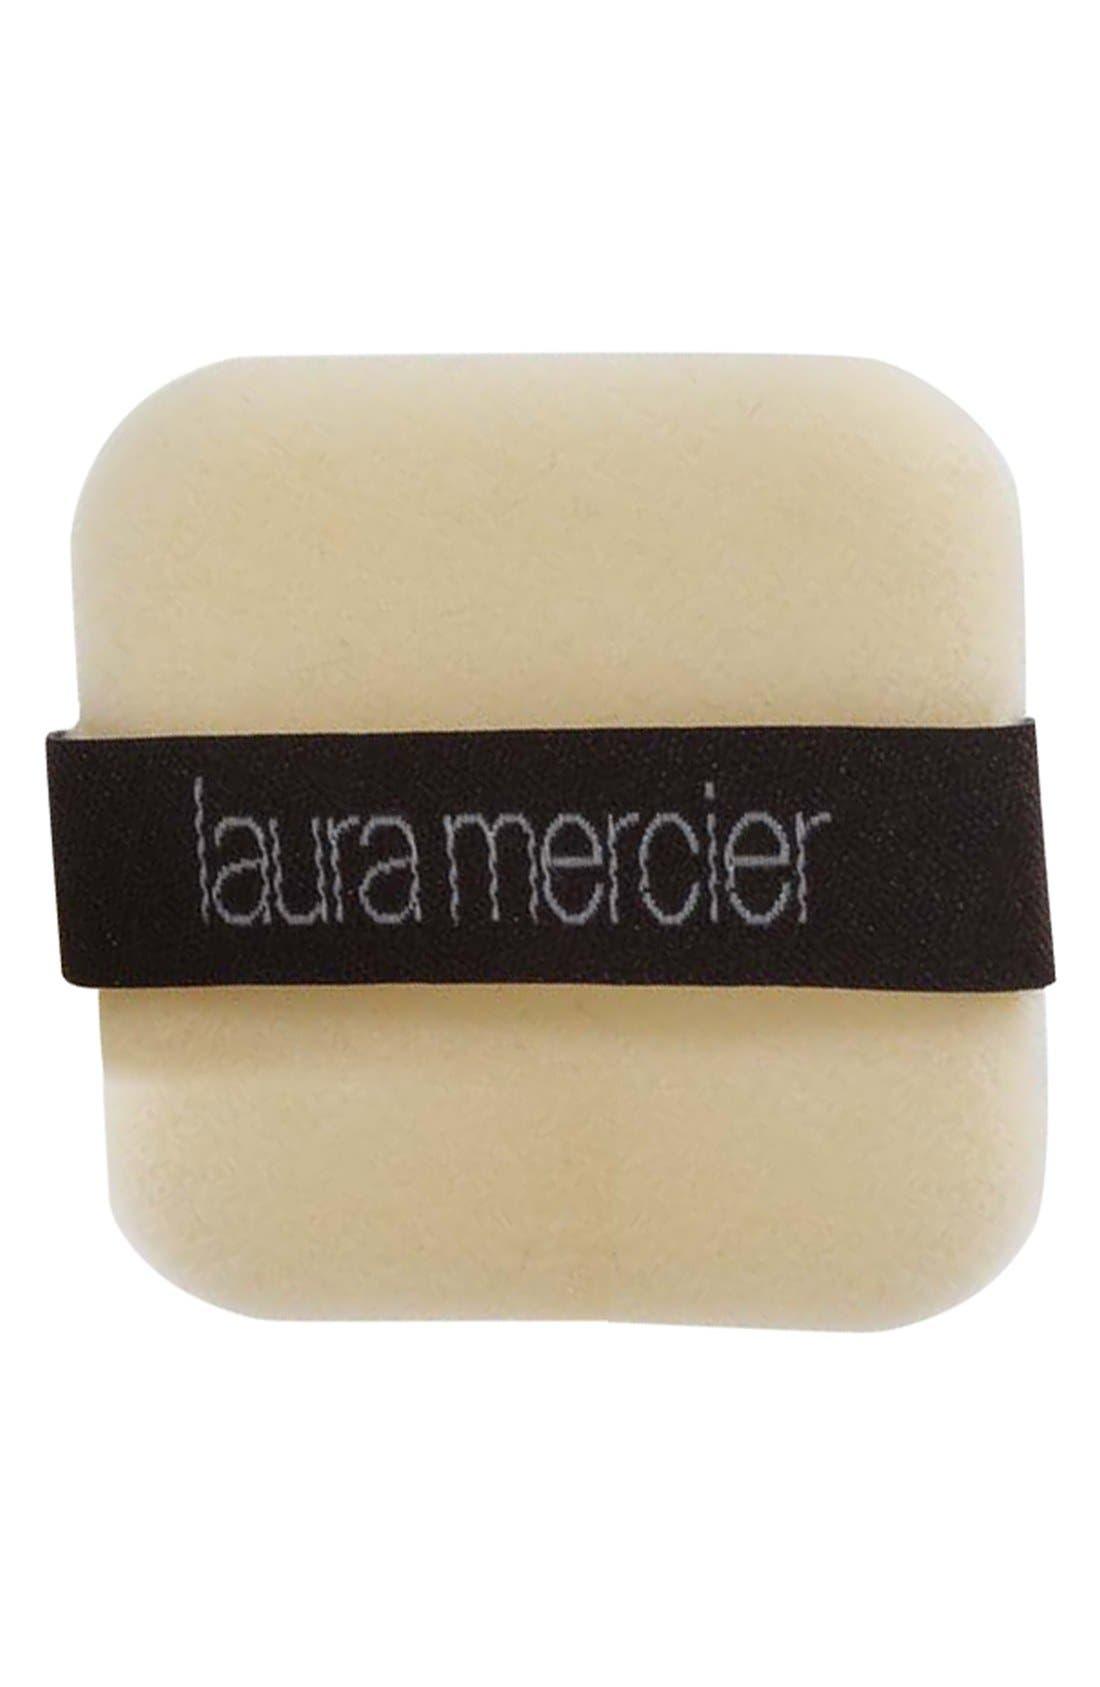 Laura Mercier 'Invisible' Pressed Powder Puff